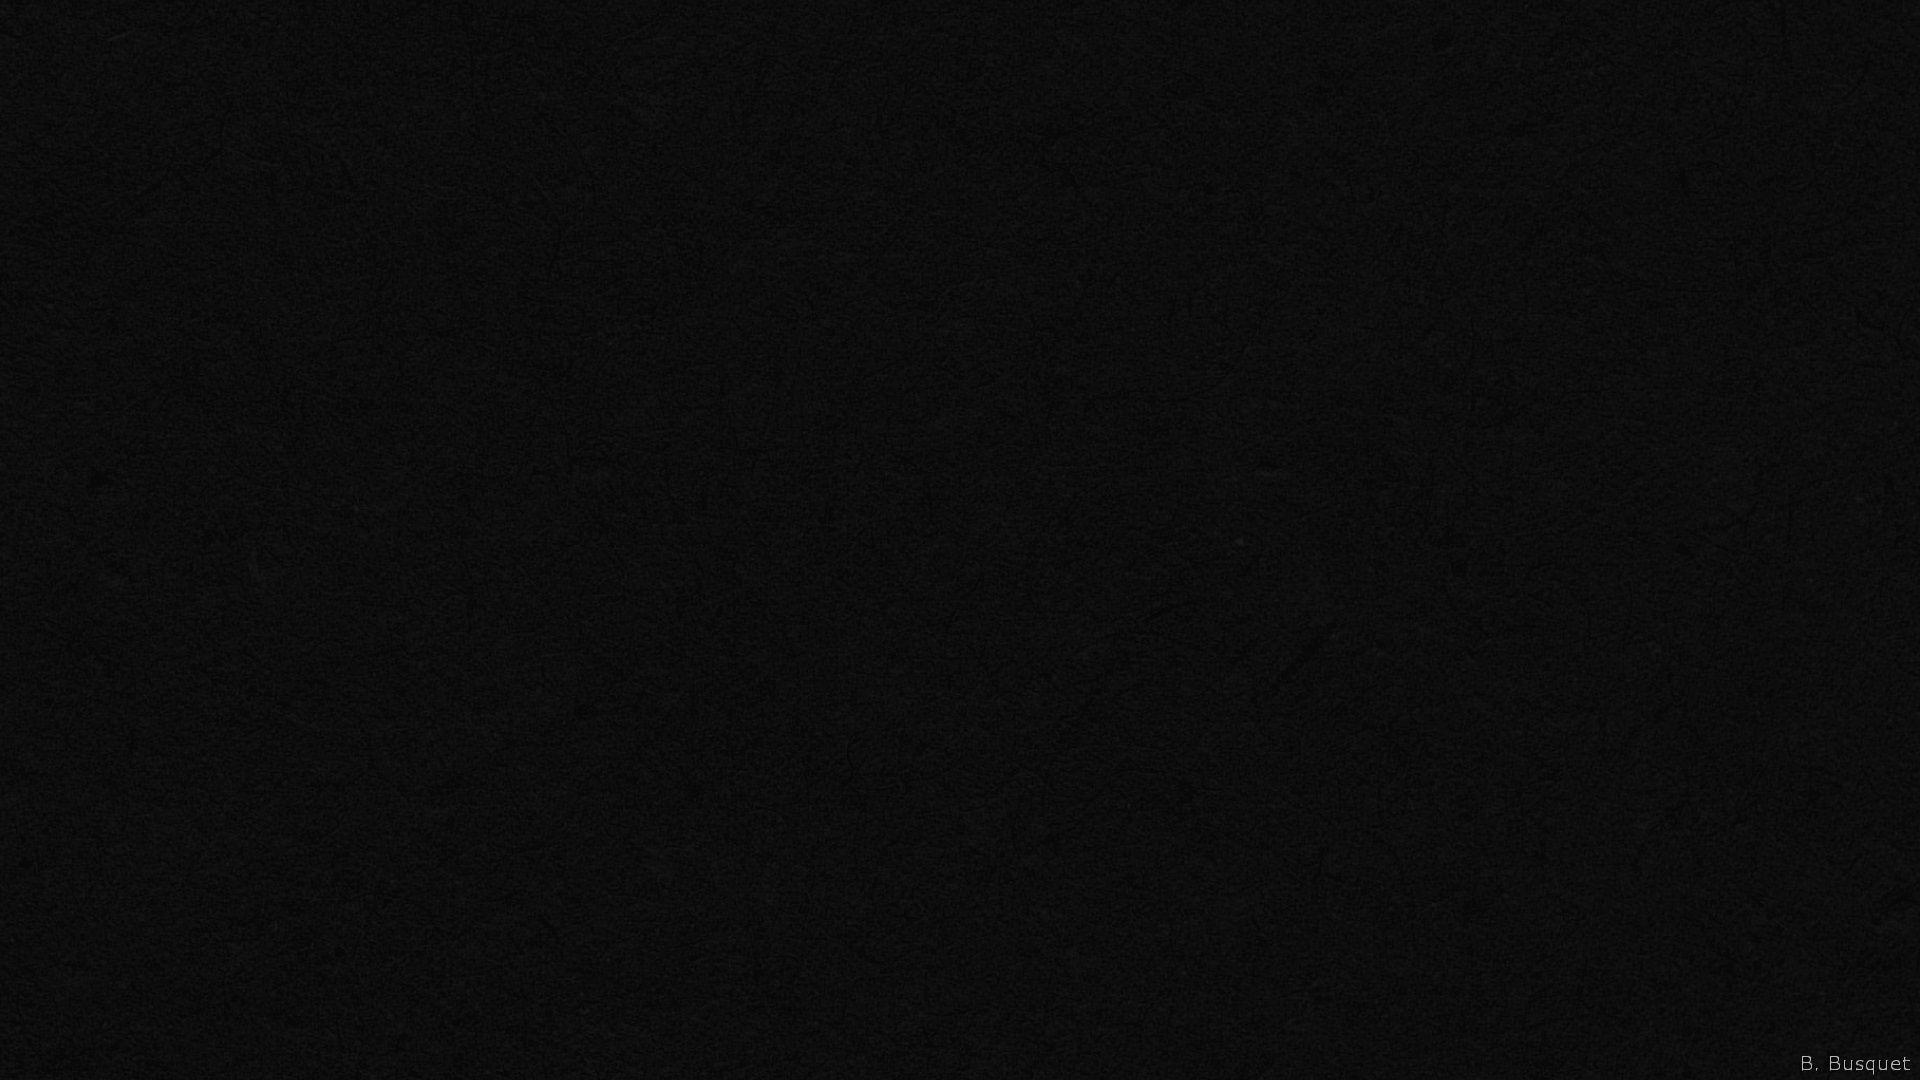 Desktop Backgrounds Hd Dark Posted By Ryan Mercado